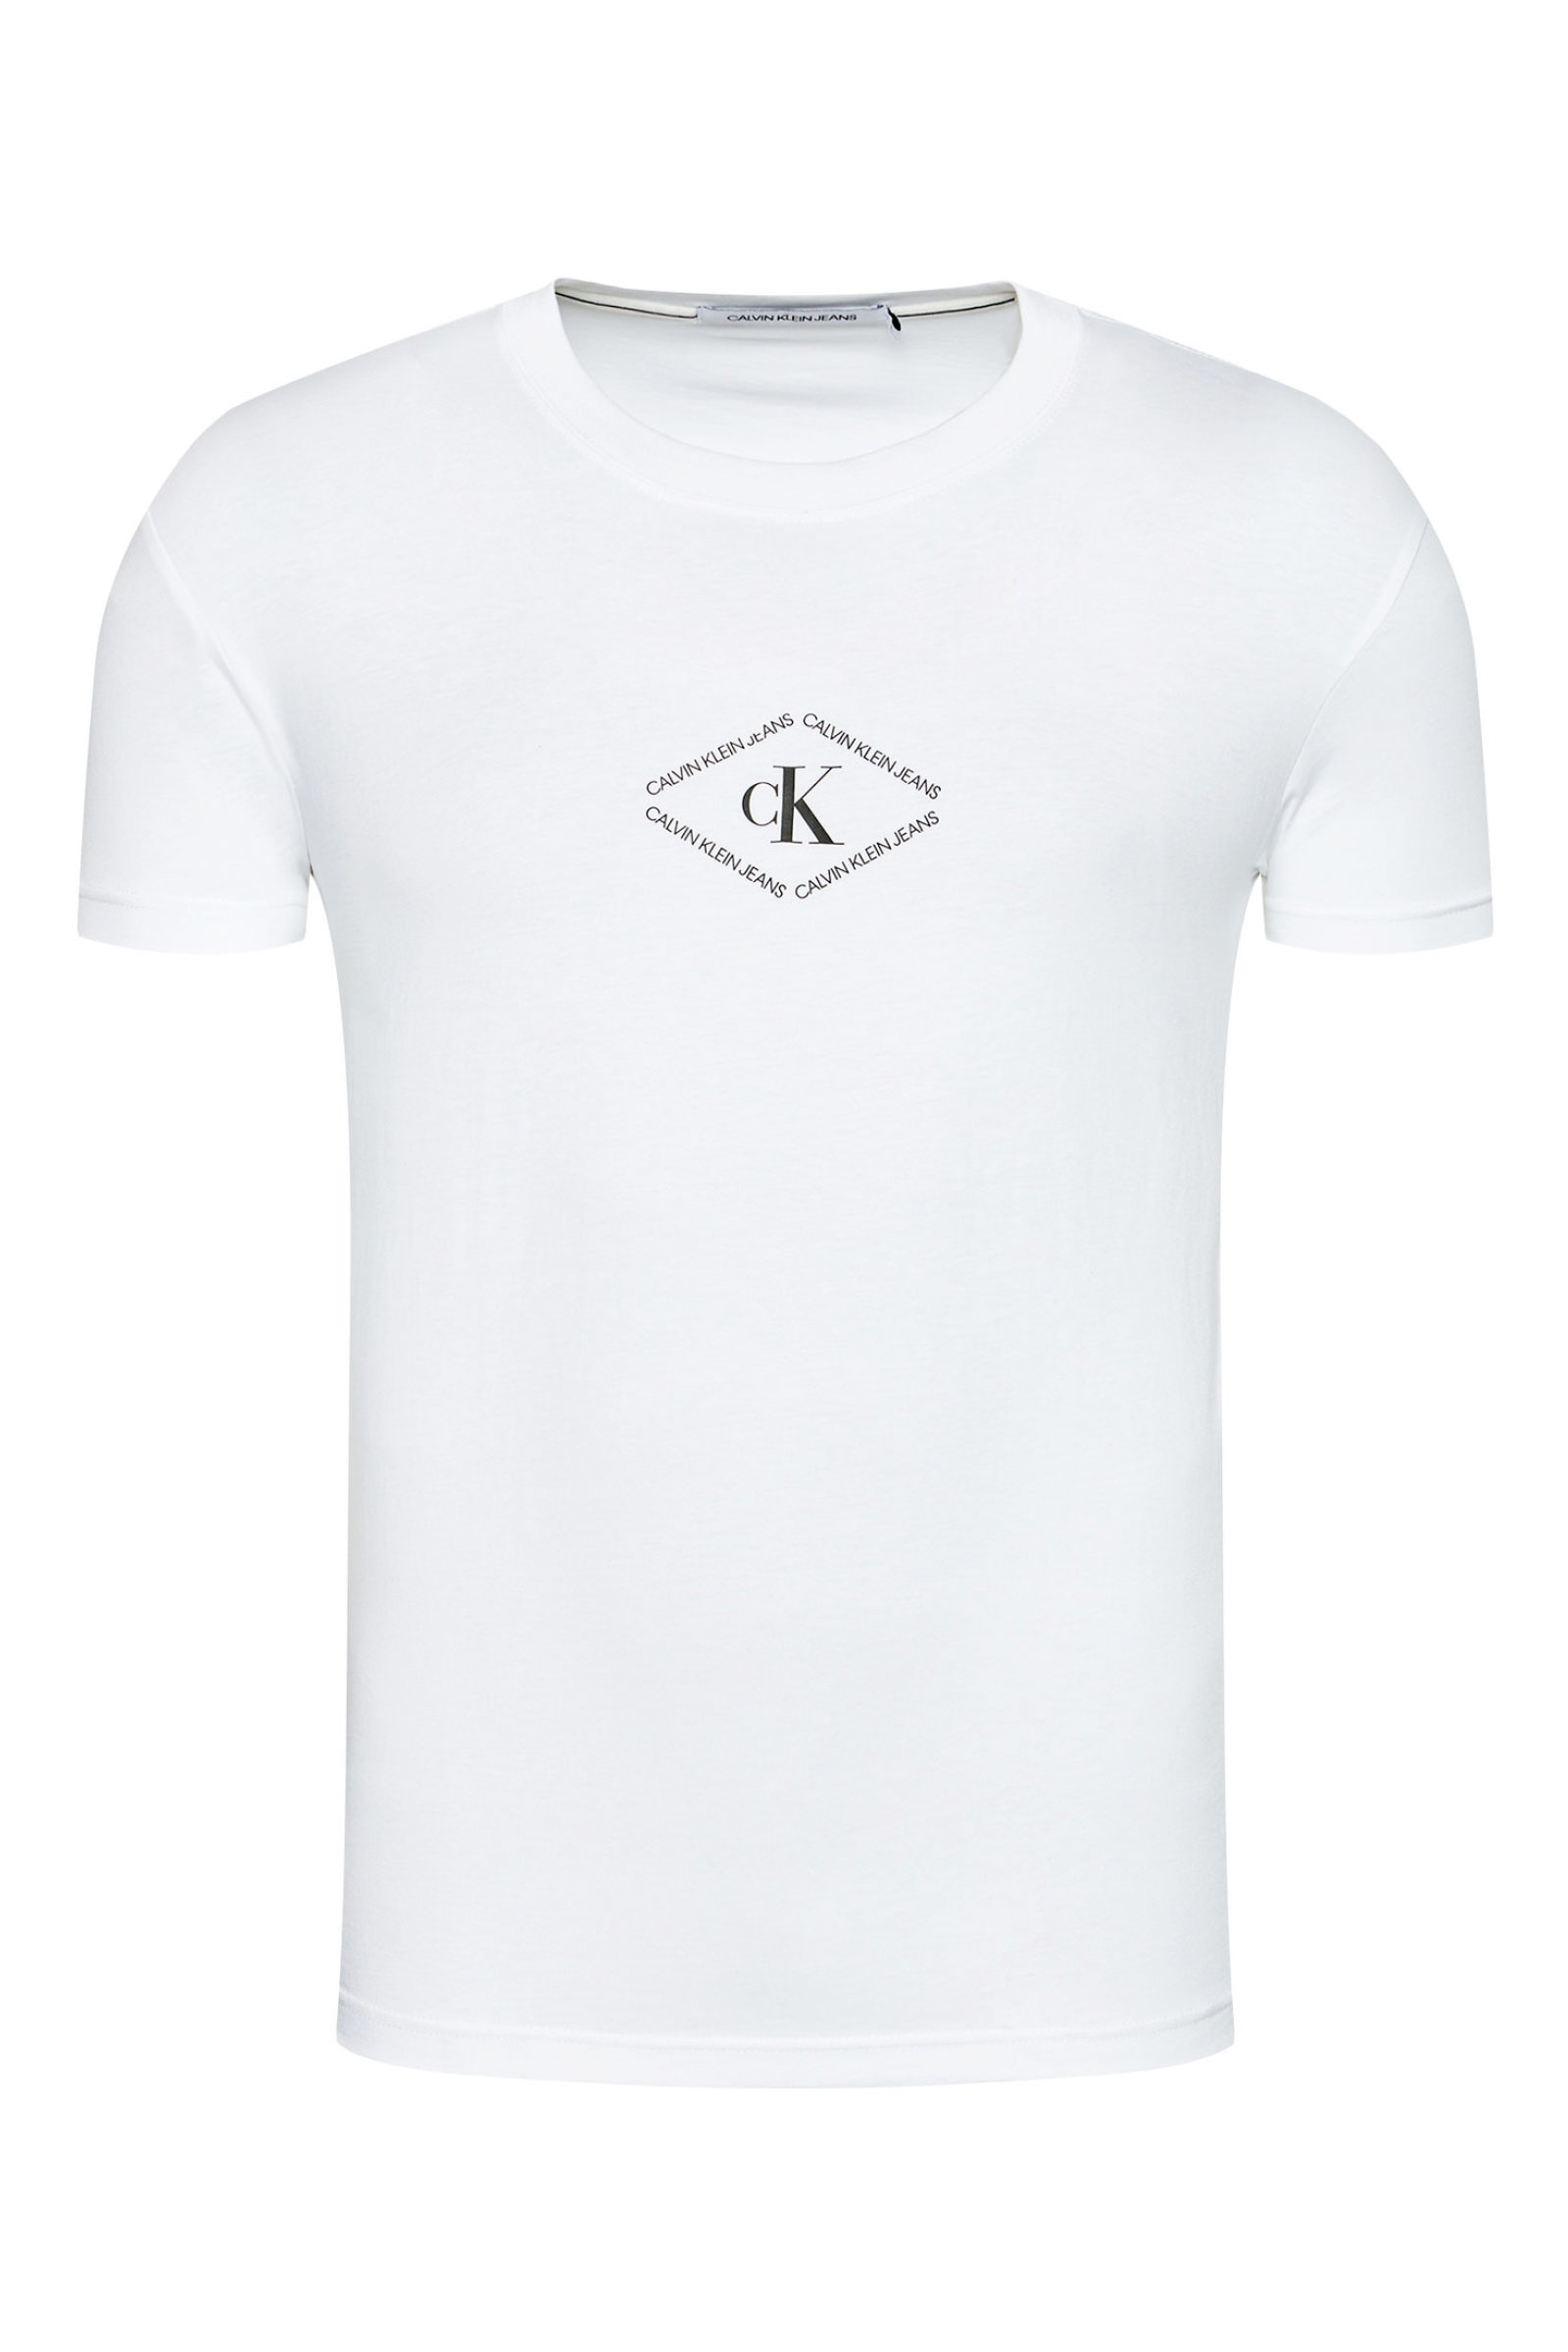 CALVIN KLEIN JEANS   T-Shirt   J30J317448YAF